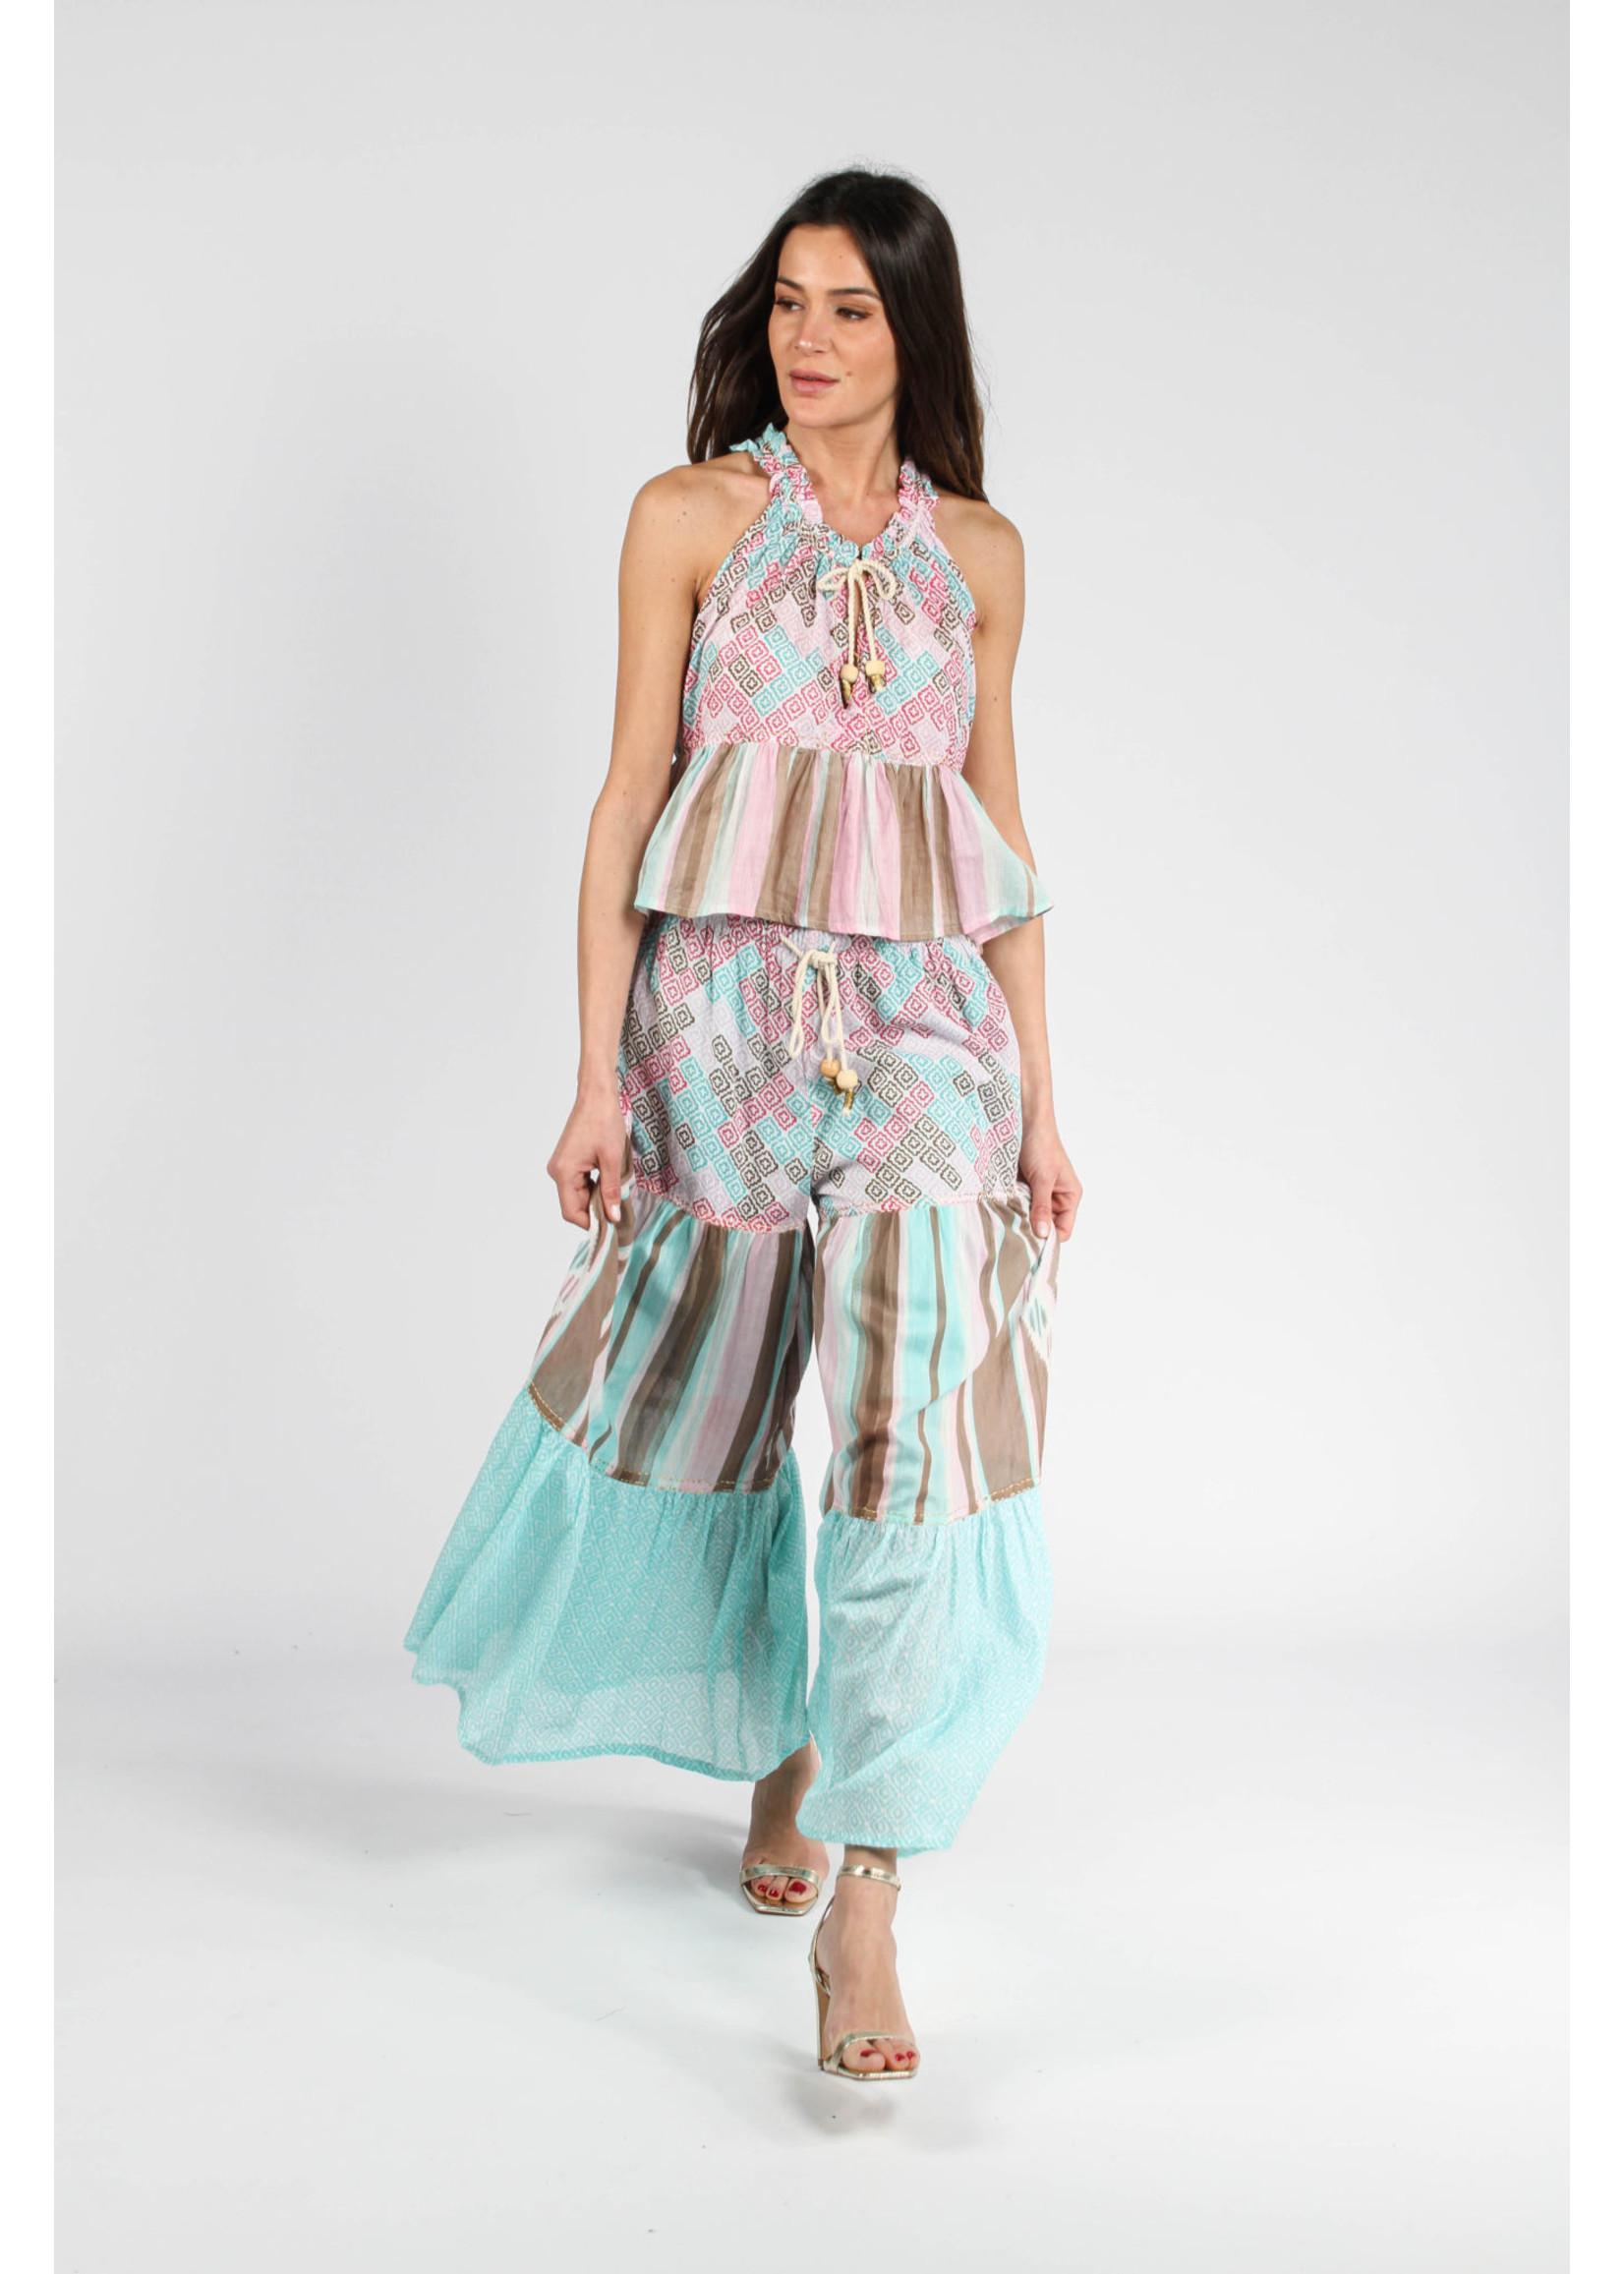 Barok Paris Sleeveless Printed Beaded Top - 21090